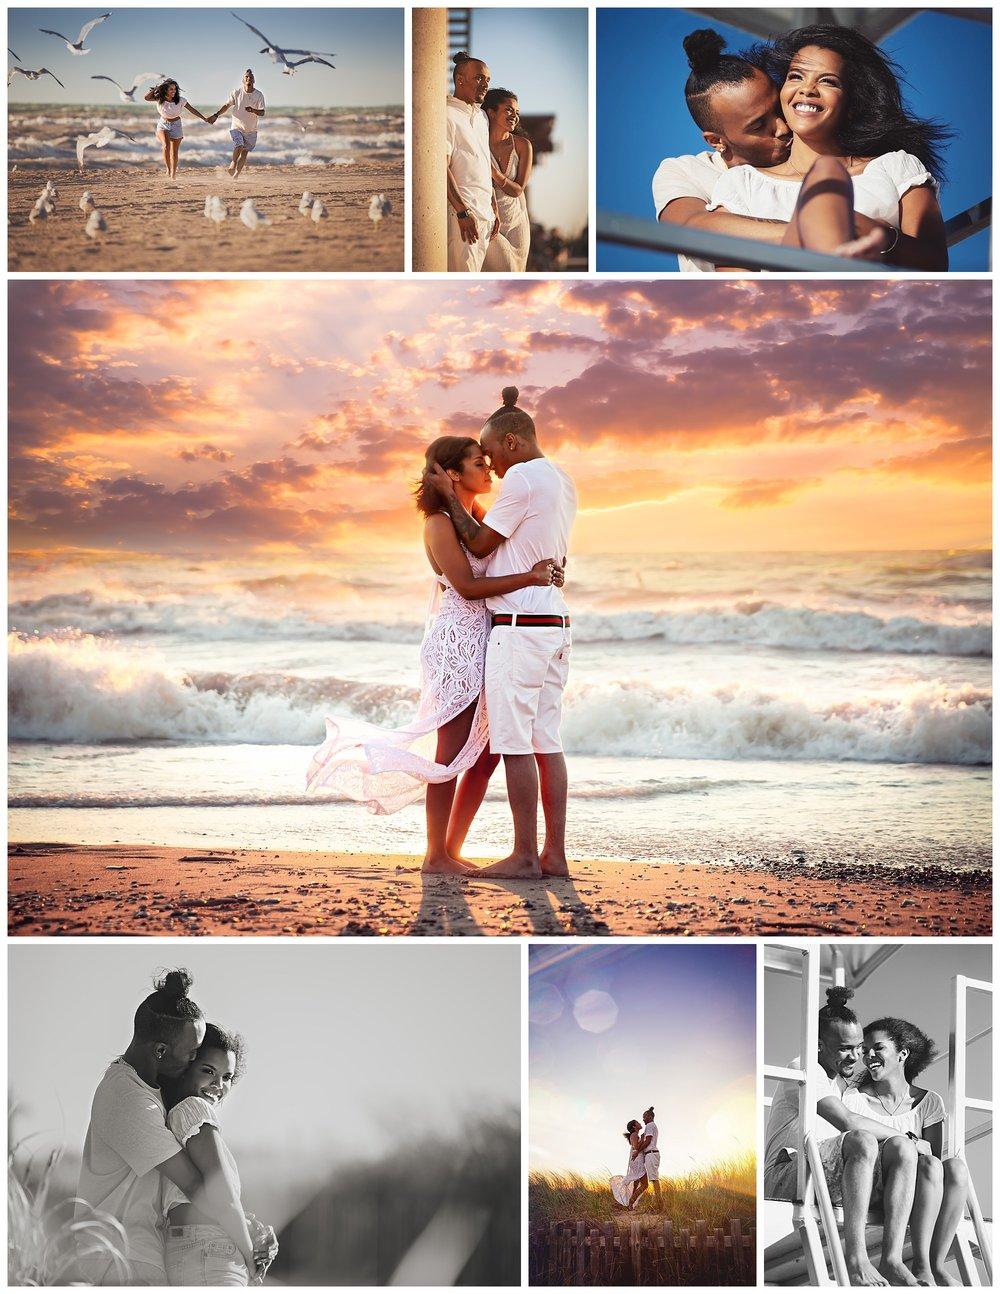 Grand Bend Beach, Ontario beach engagement photos by VanDaele & Russell